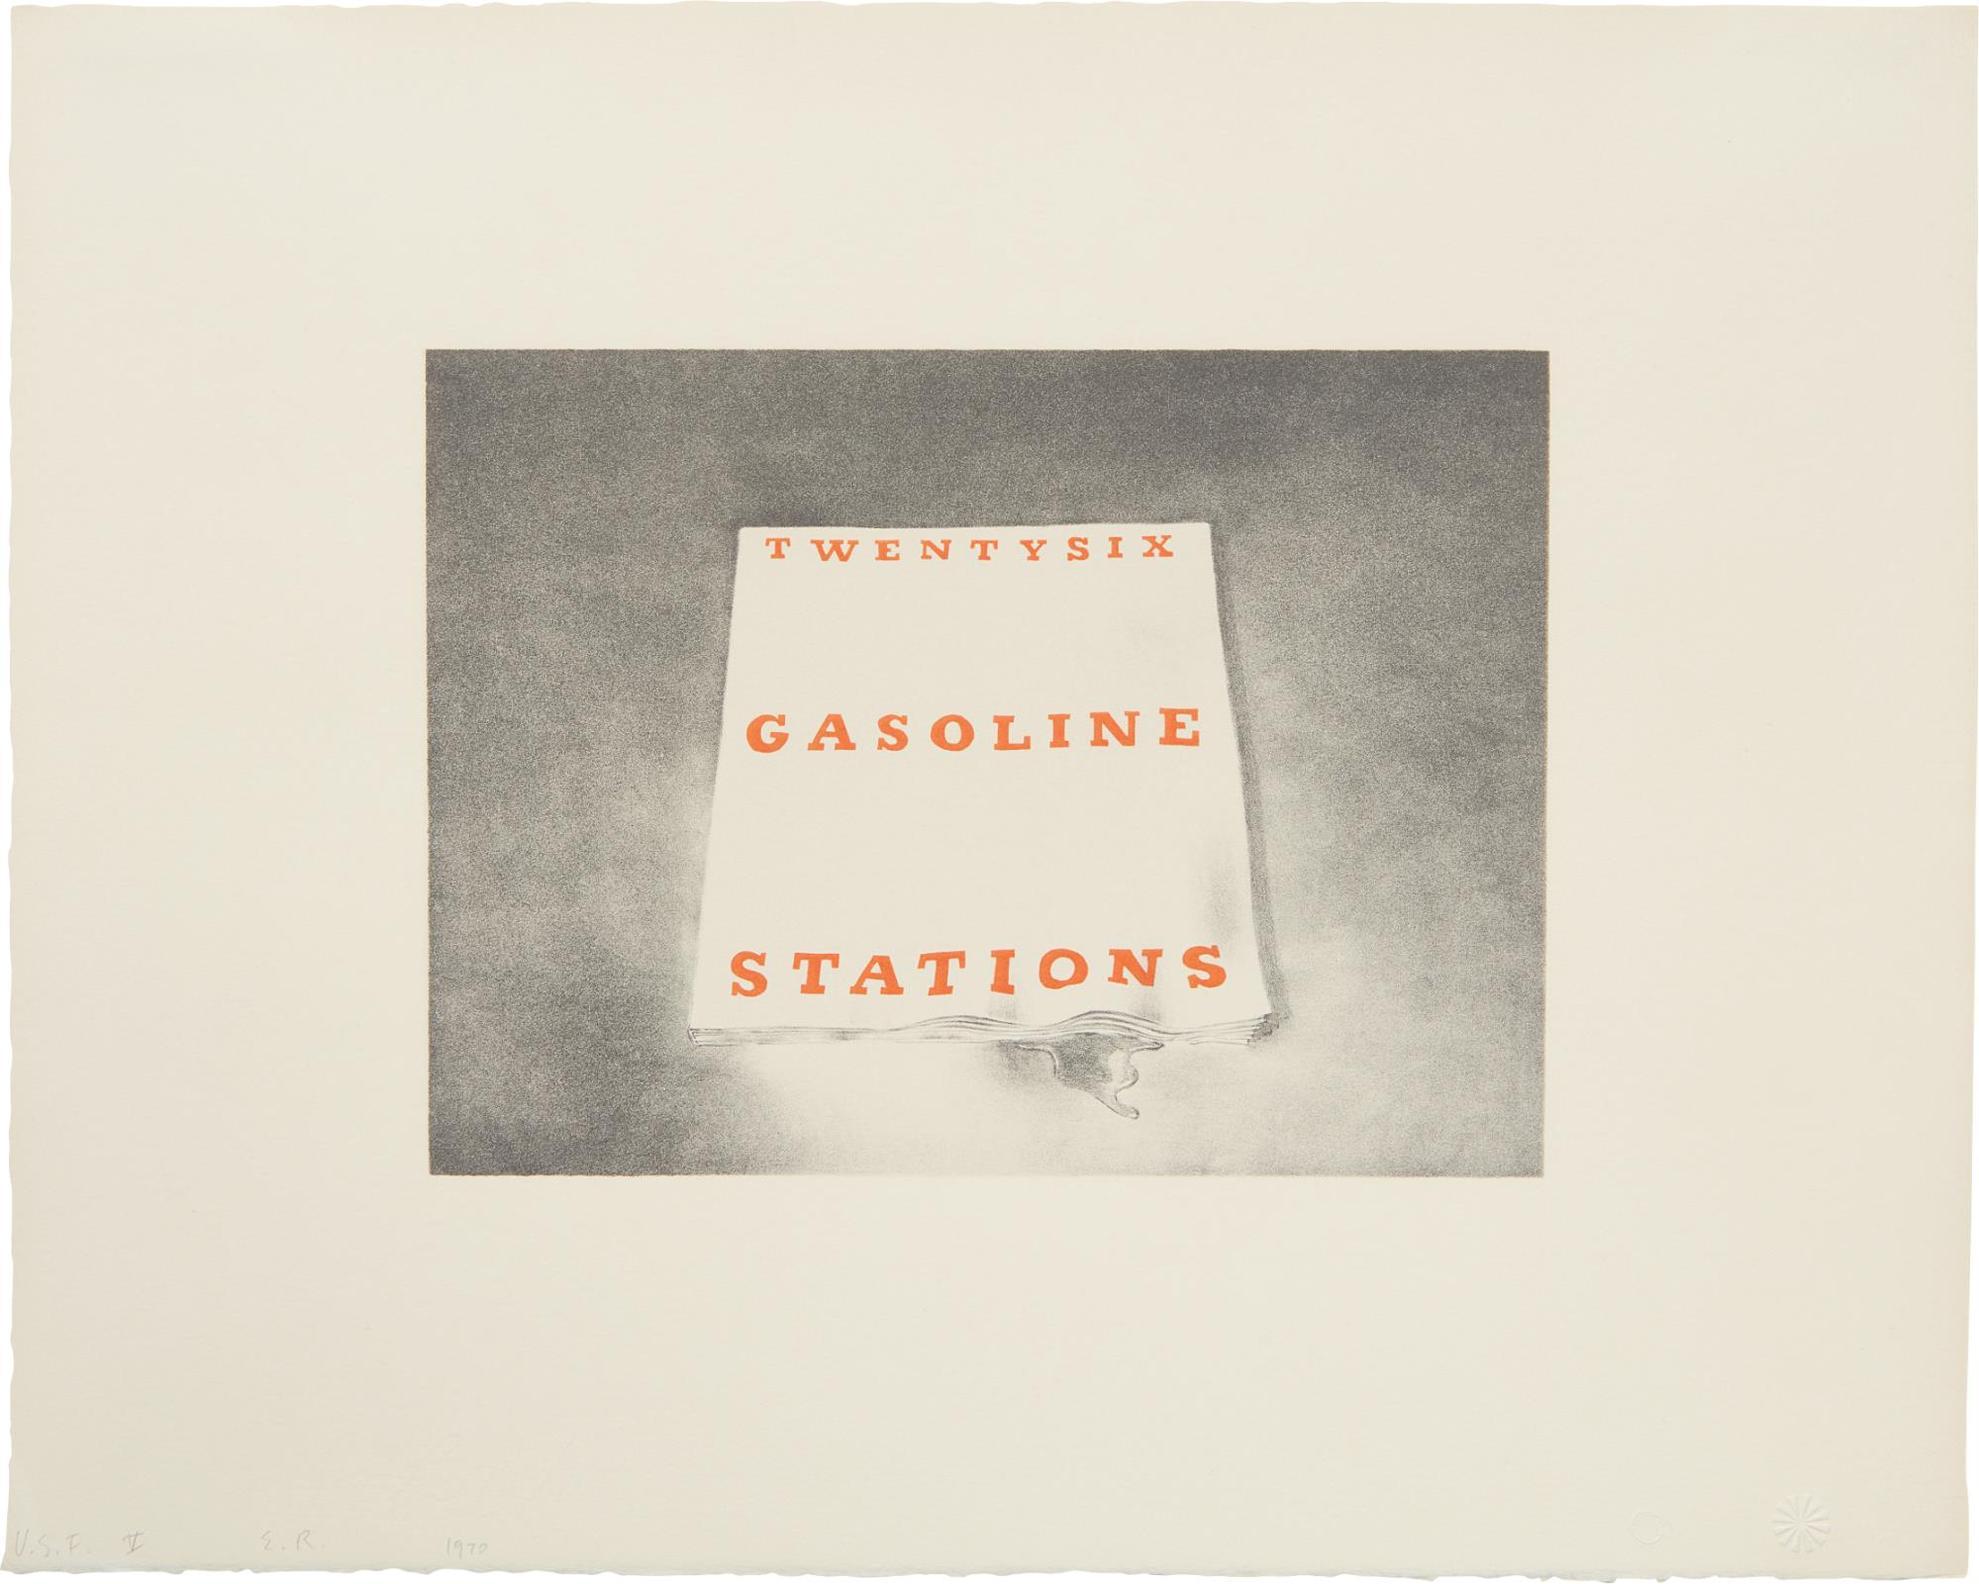 Ed Ruscha-Twentysix Gasoline Stations, From Book Covers-1970